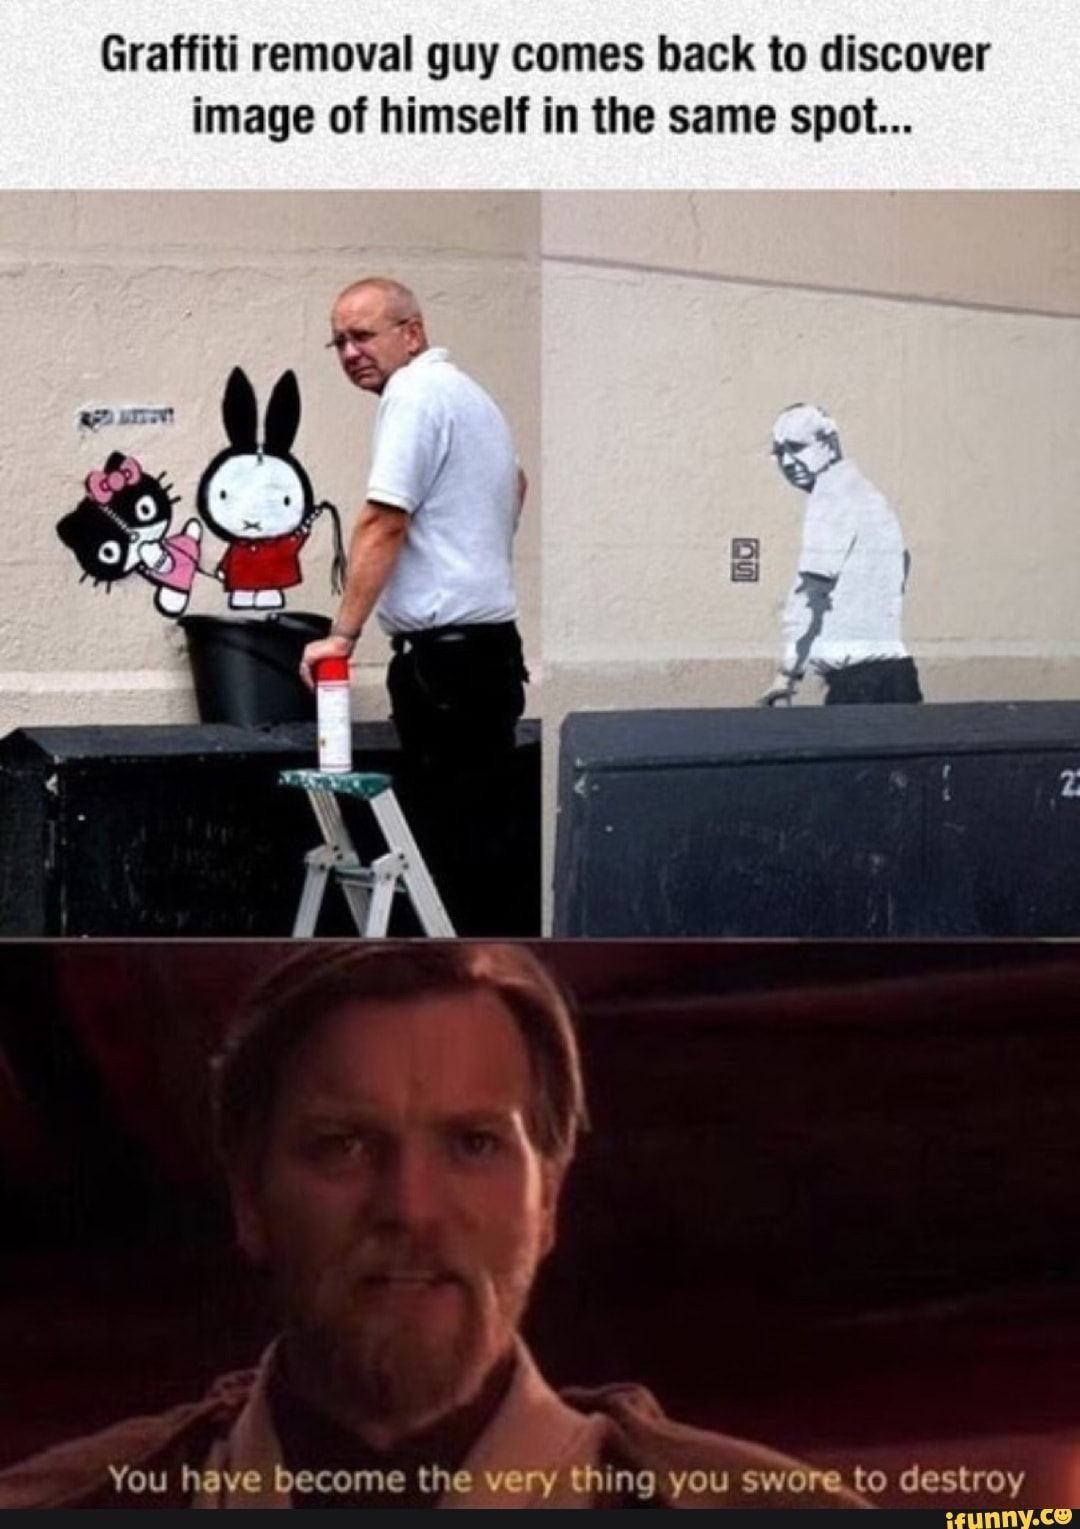 Everybody gets a meme